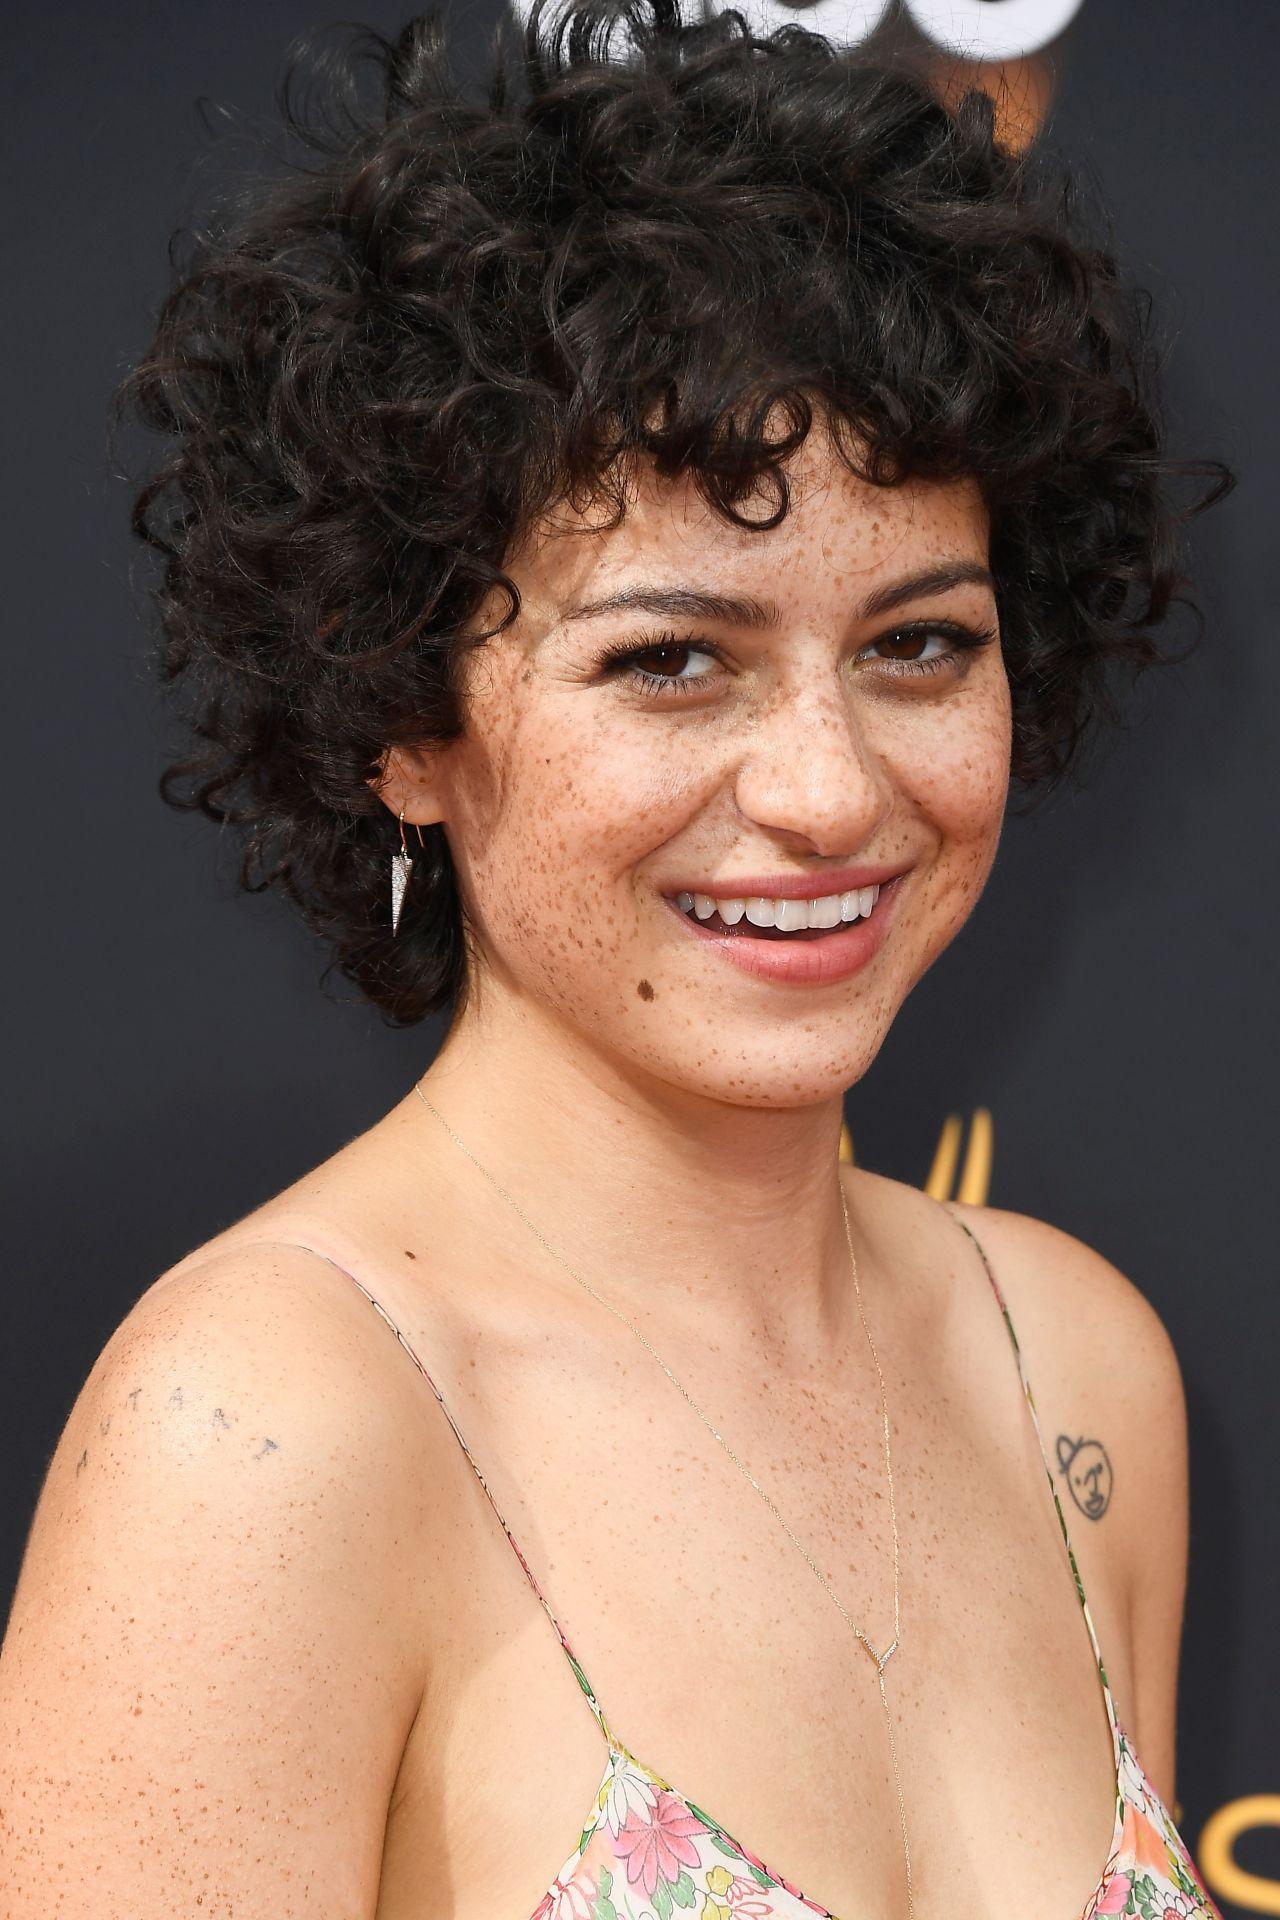 Alia Shawkat Primetime Emmy Awards In Los Angeles 09 18 2016